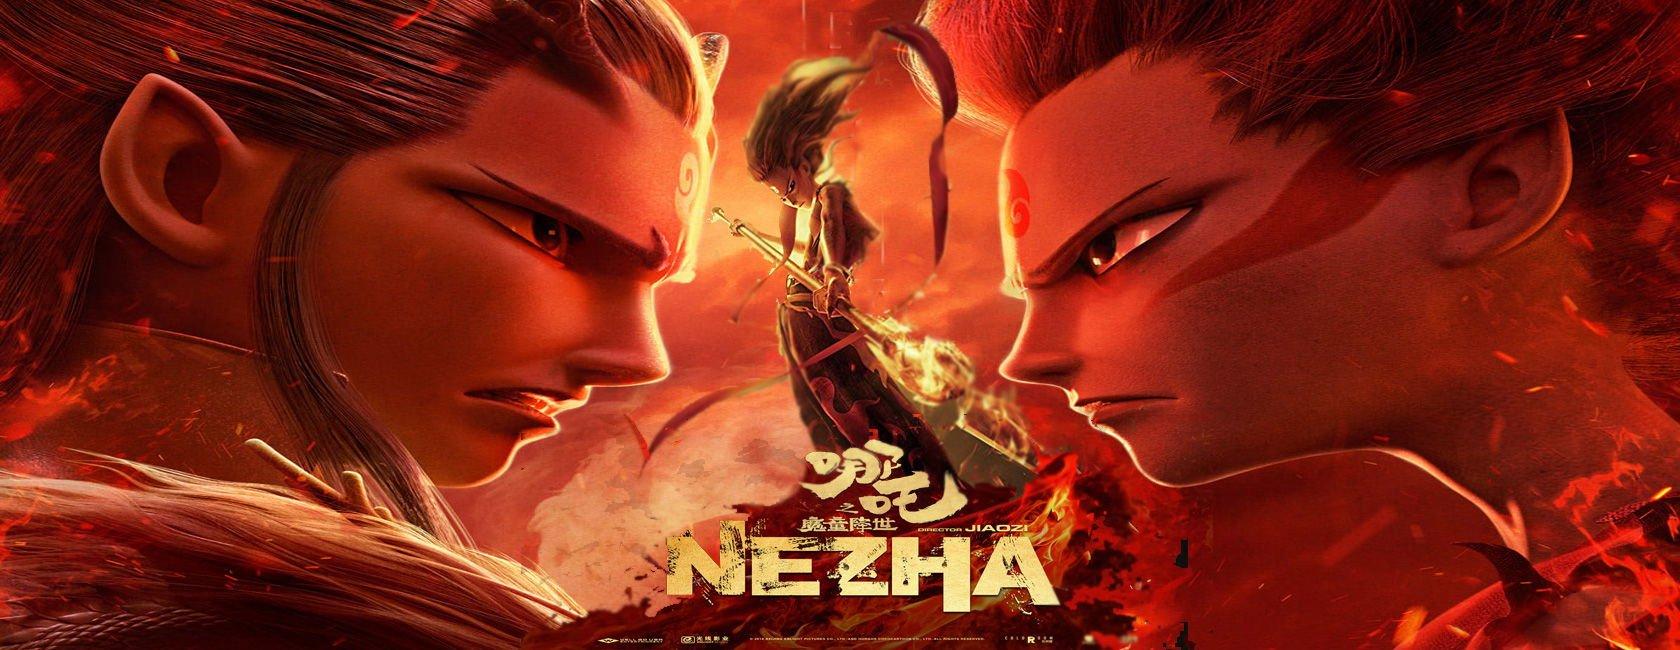 Nezha Birth Of The Demon Child 2019 Eng Sub Indo Kurina Official